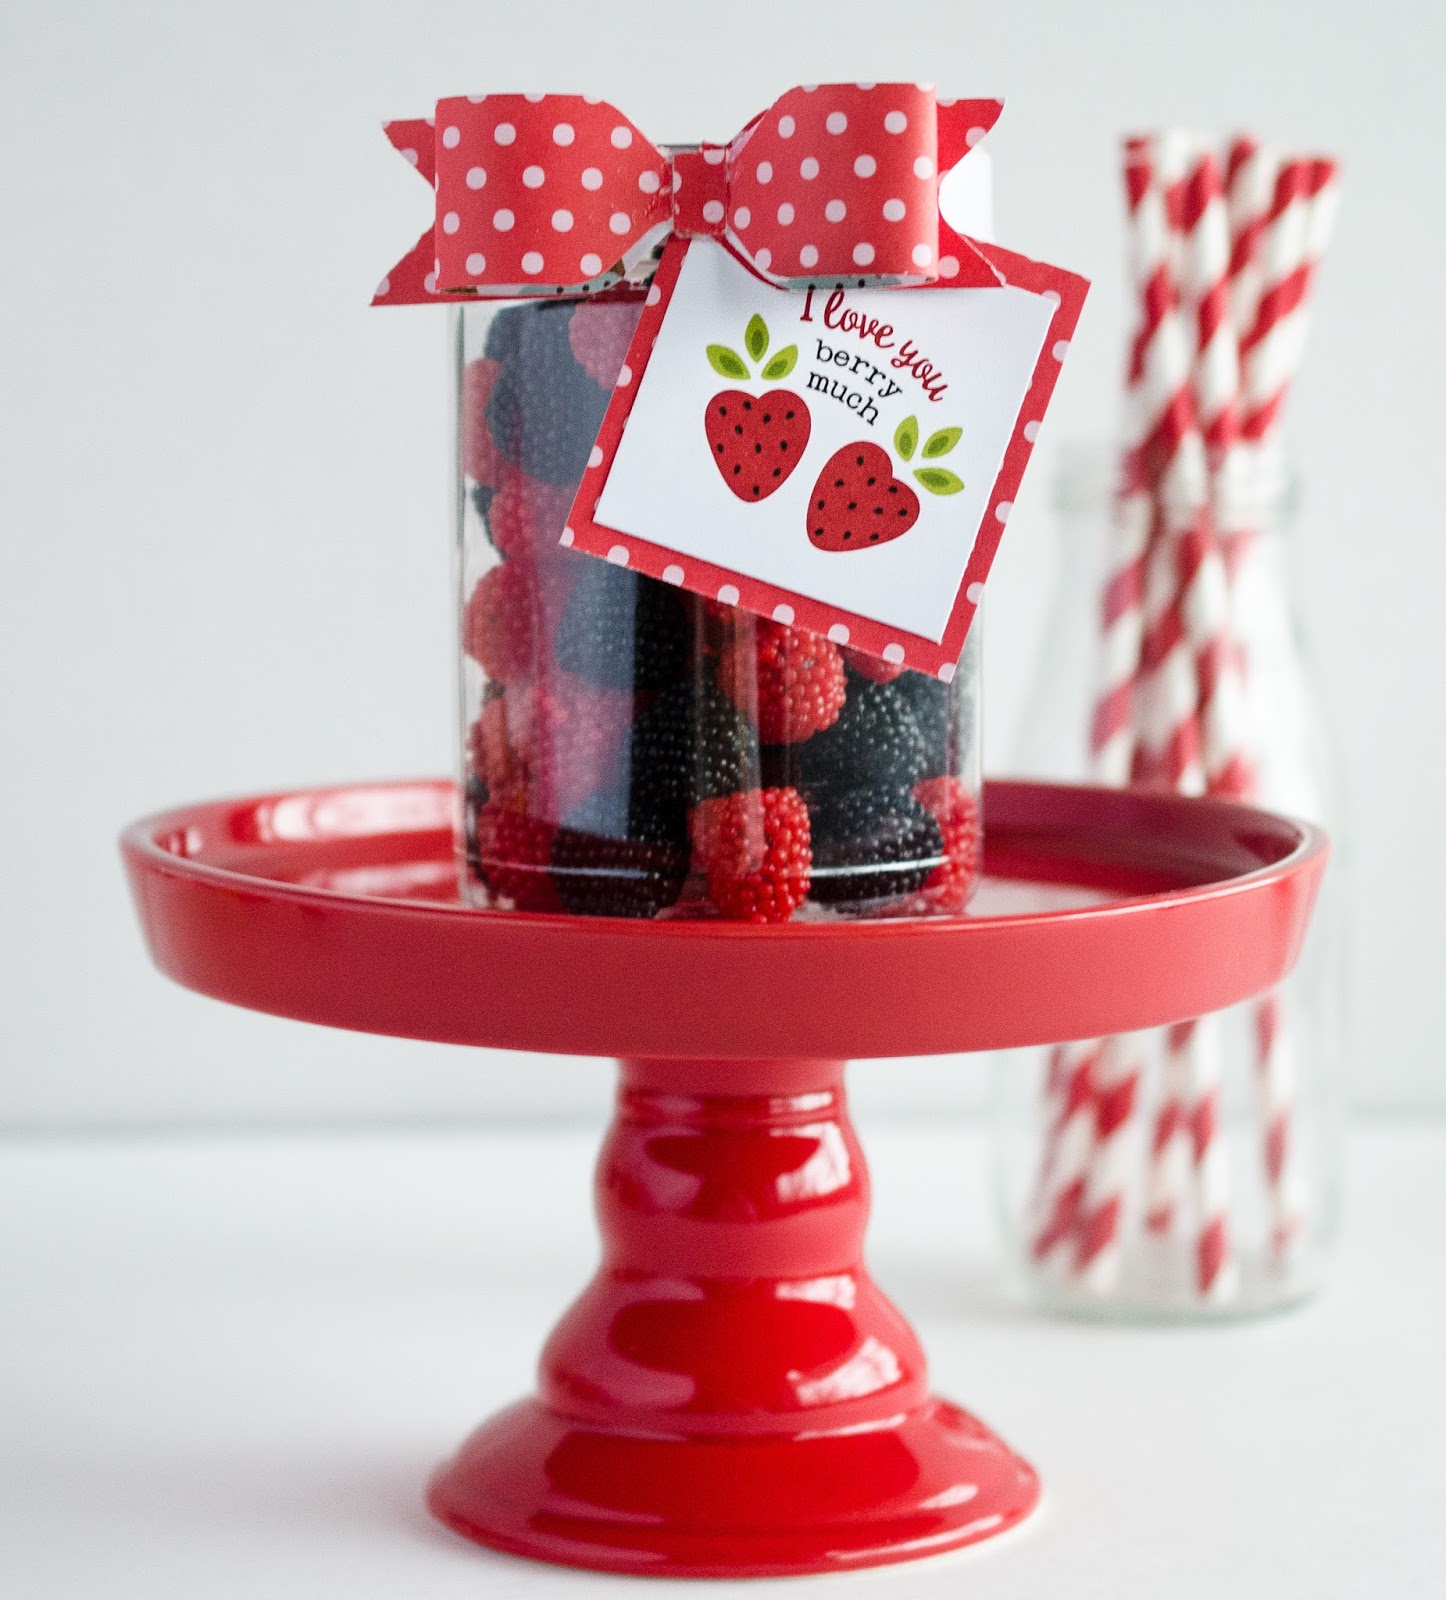 Sweet valentine gift ideas eighteen25 sweet valentine gift ideas i love you berry much negle Gallery